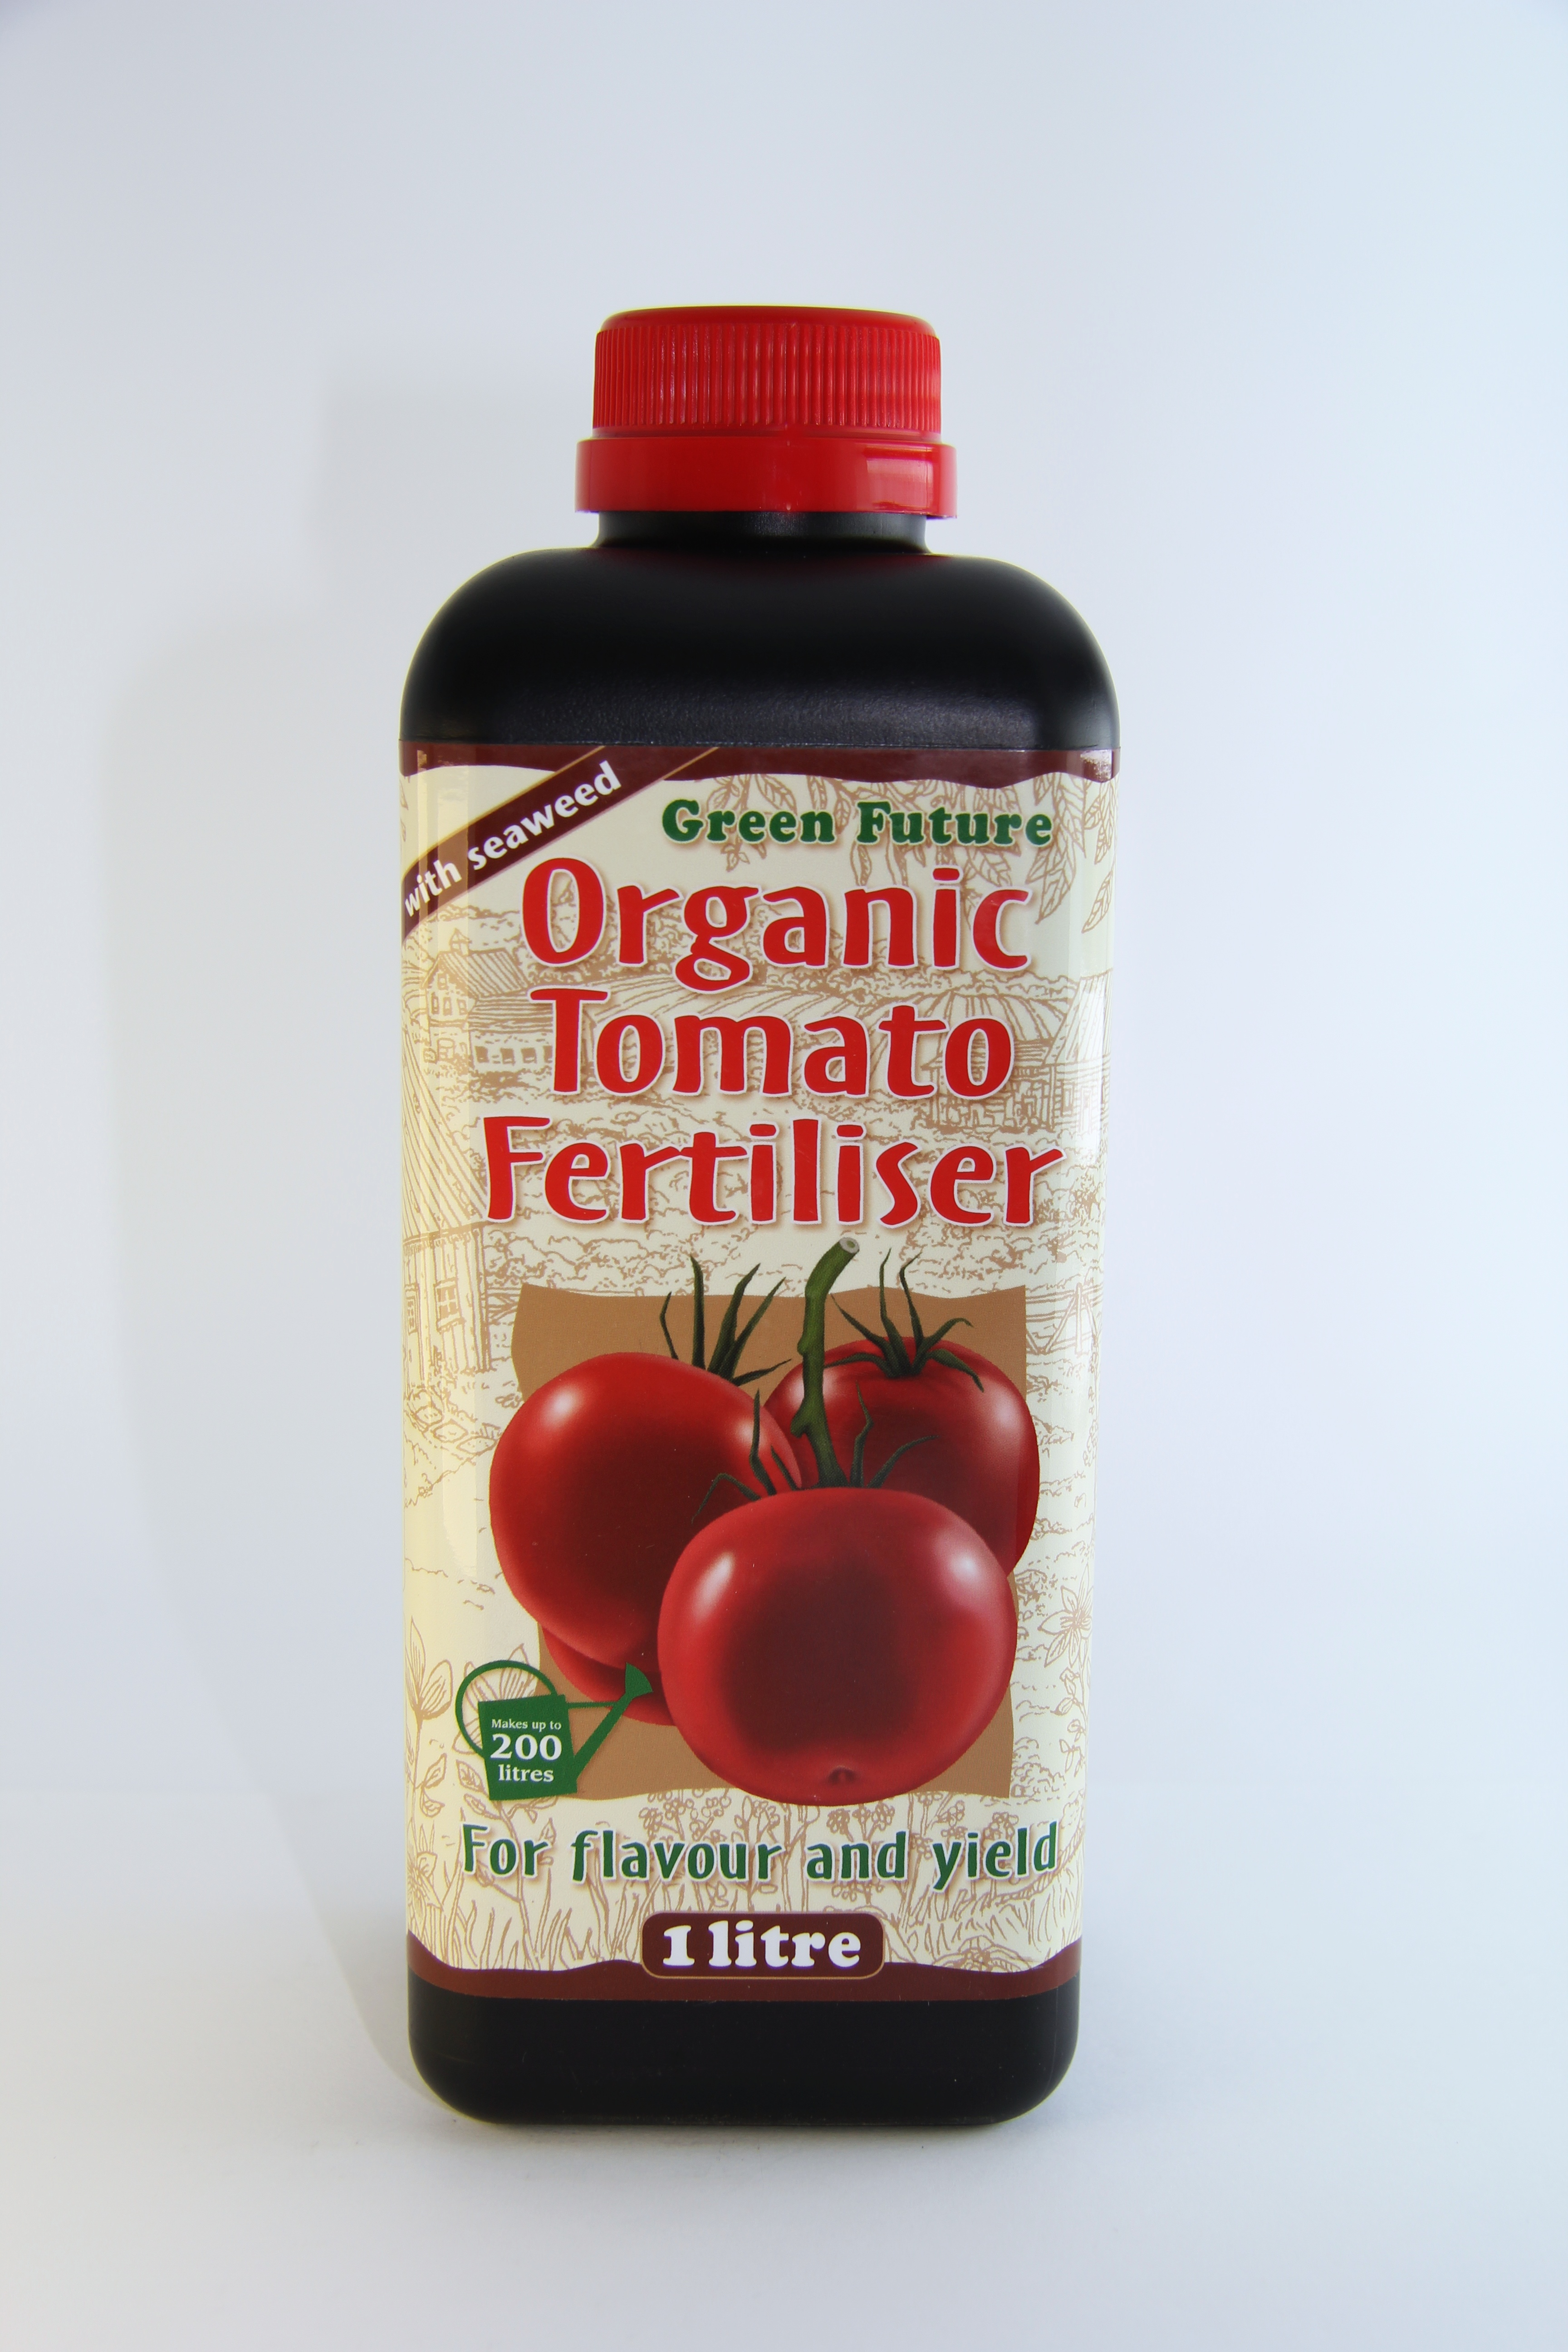 Green Future Organic Tomato Fertiliser 1 l Growth Technology - speciální hnojivo pro rajčata pro lep